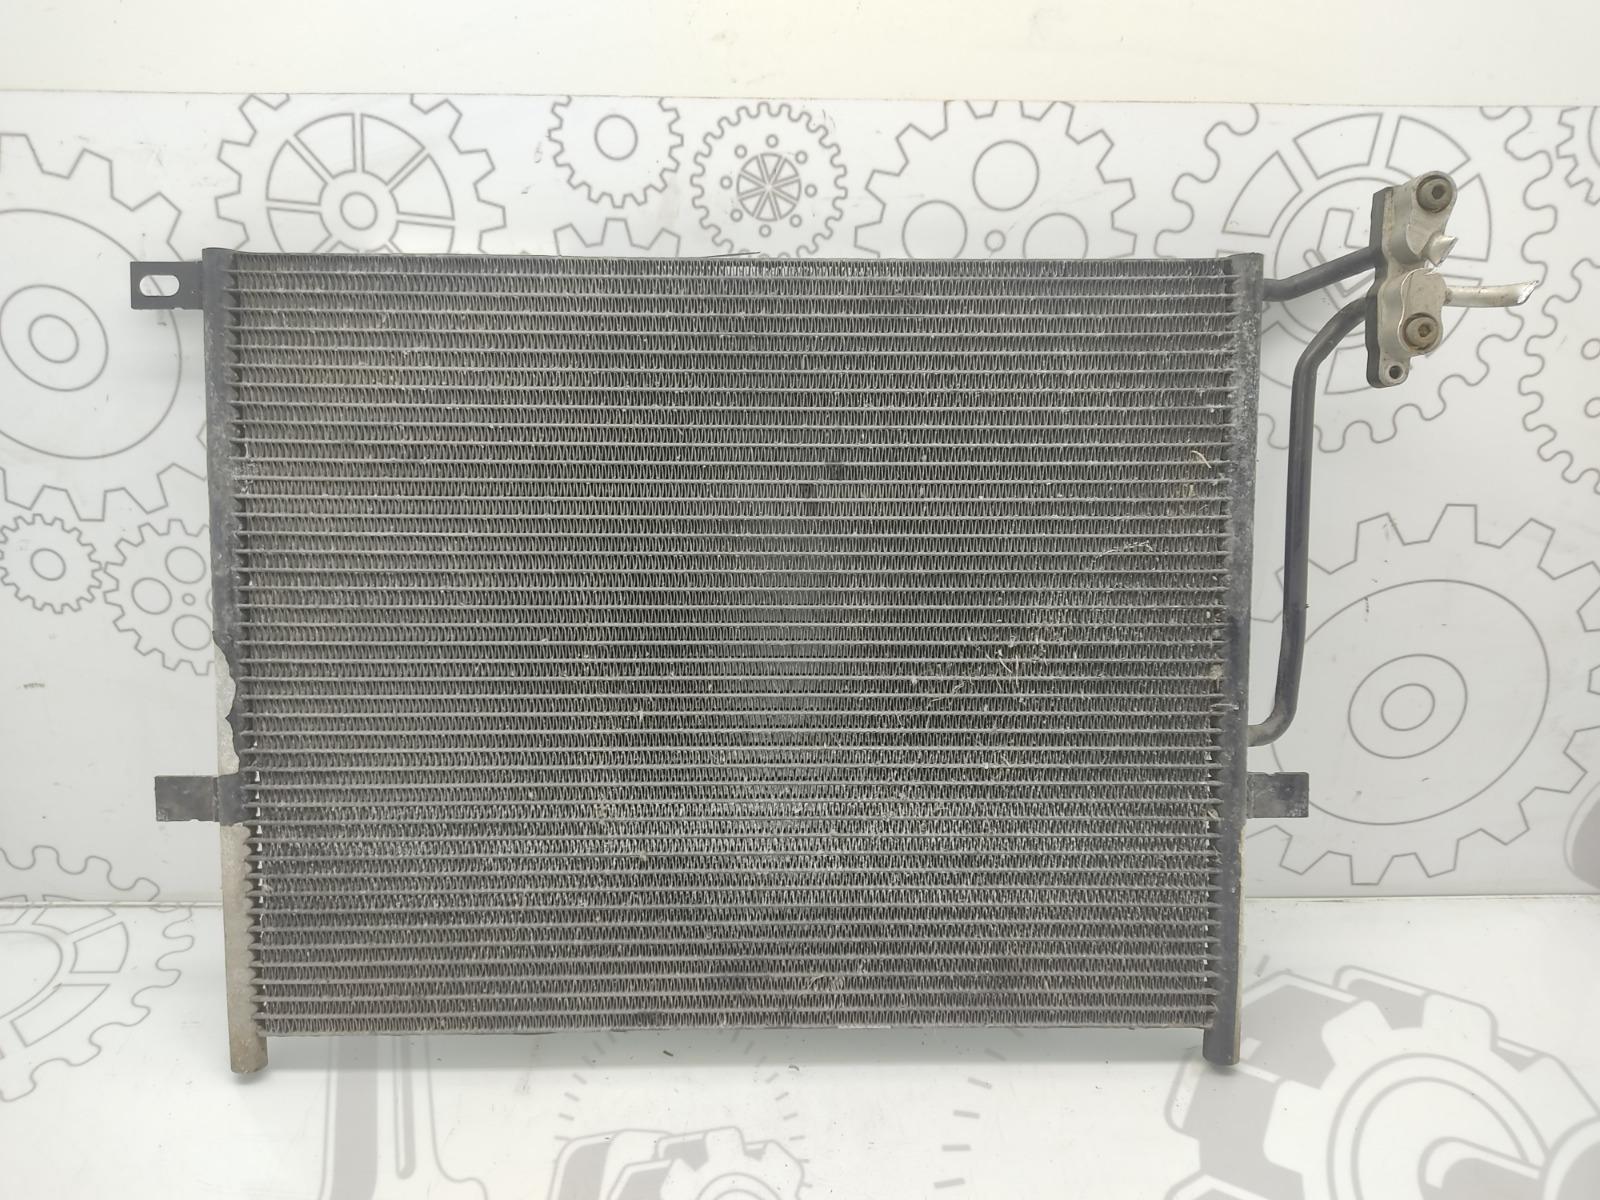 Радиатор кондиционера Bmw 3 E46 2.5 I 2003 (б/у)